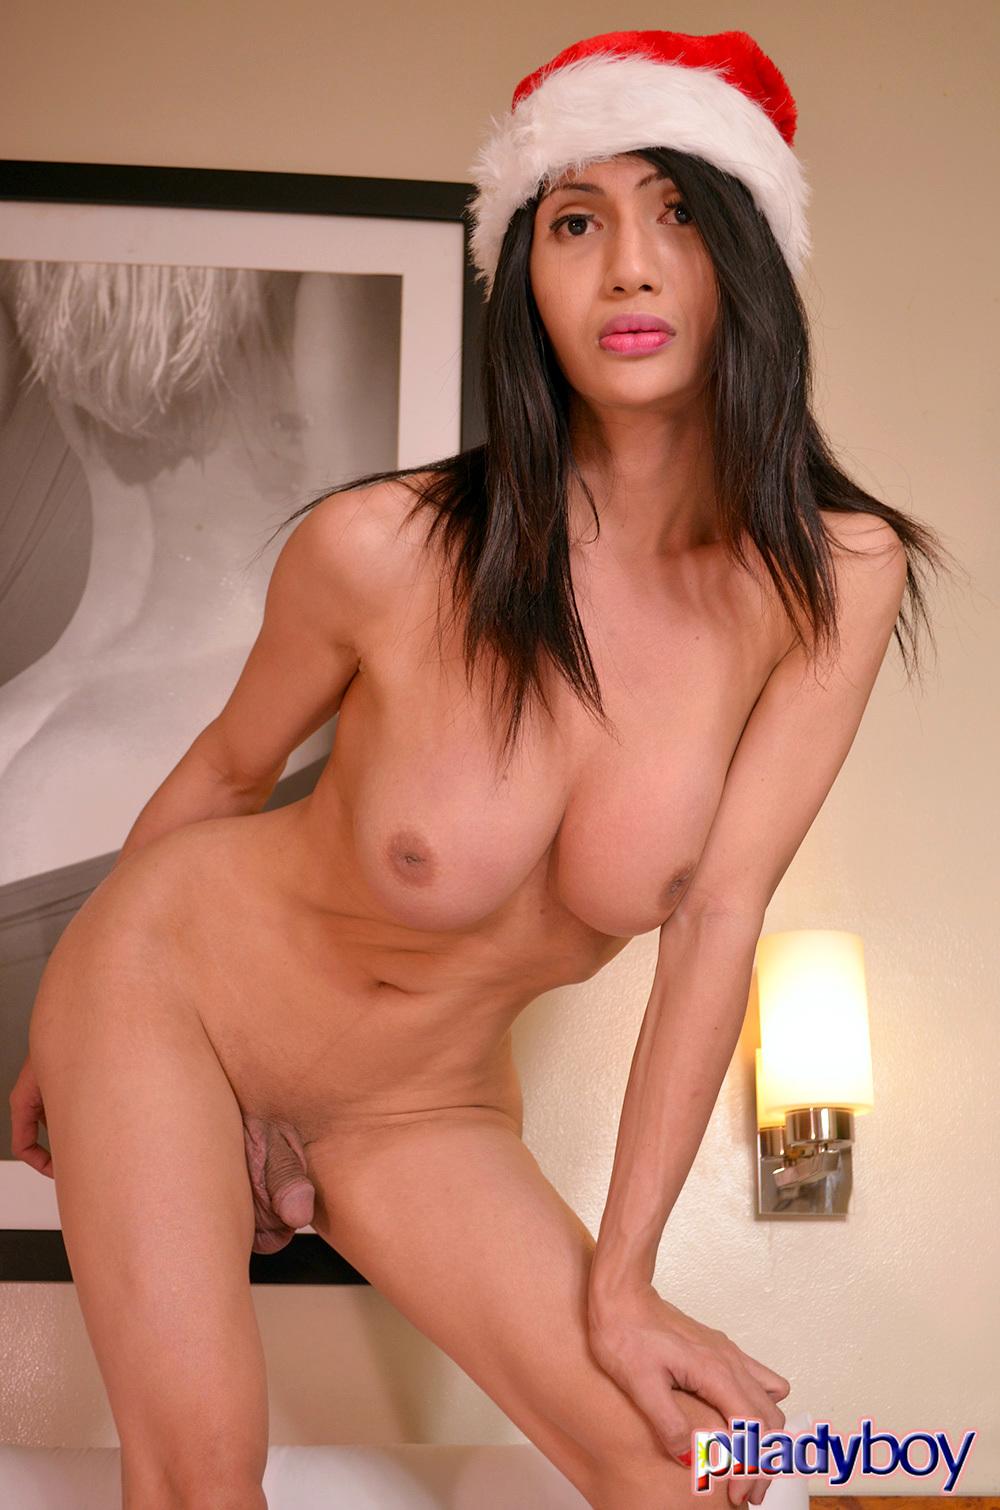 Pauline Diaz: Flirtatious Yuletide Candy Cane 1